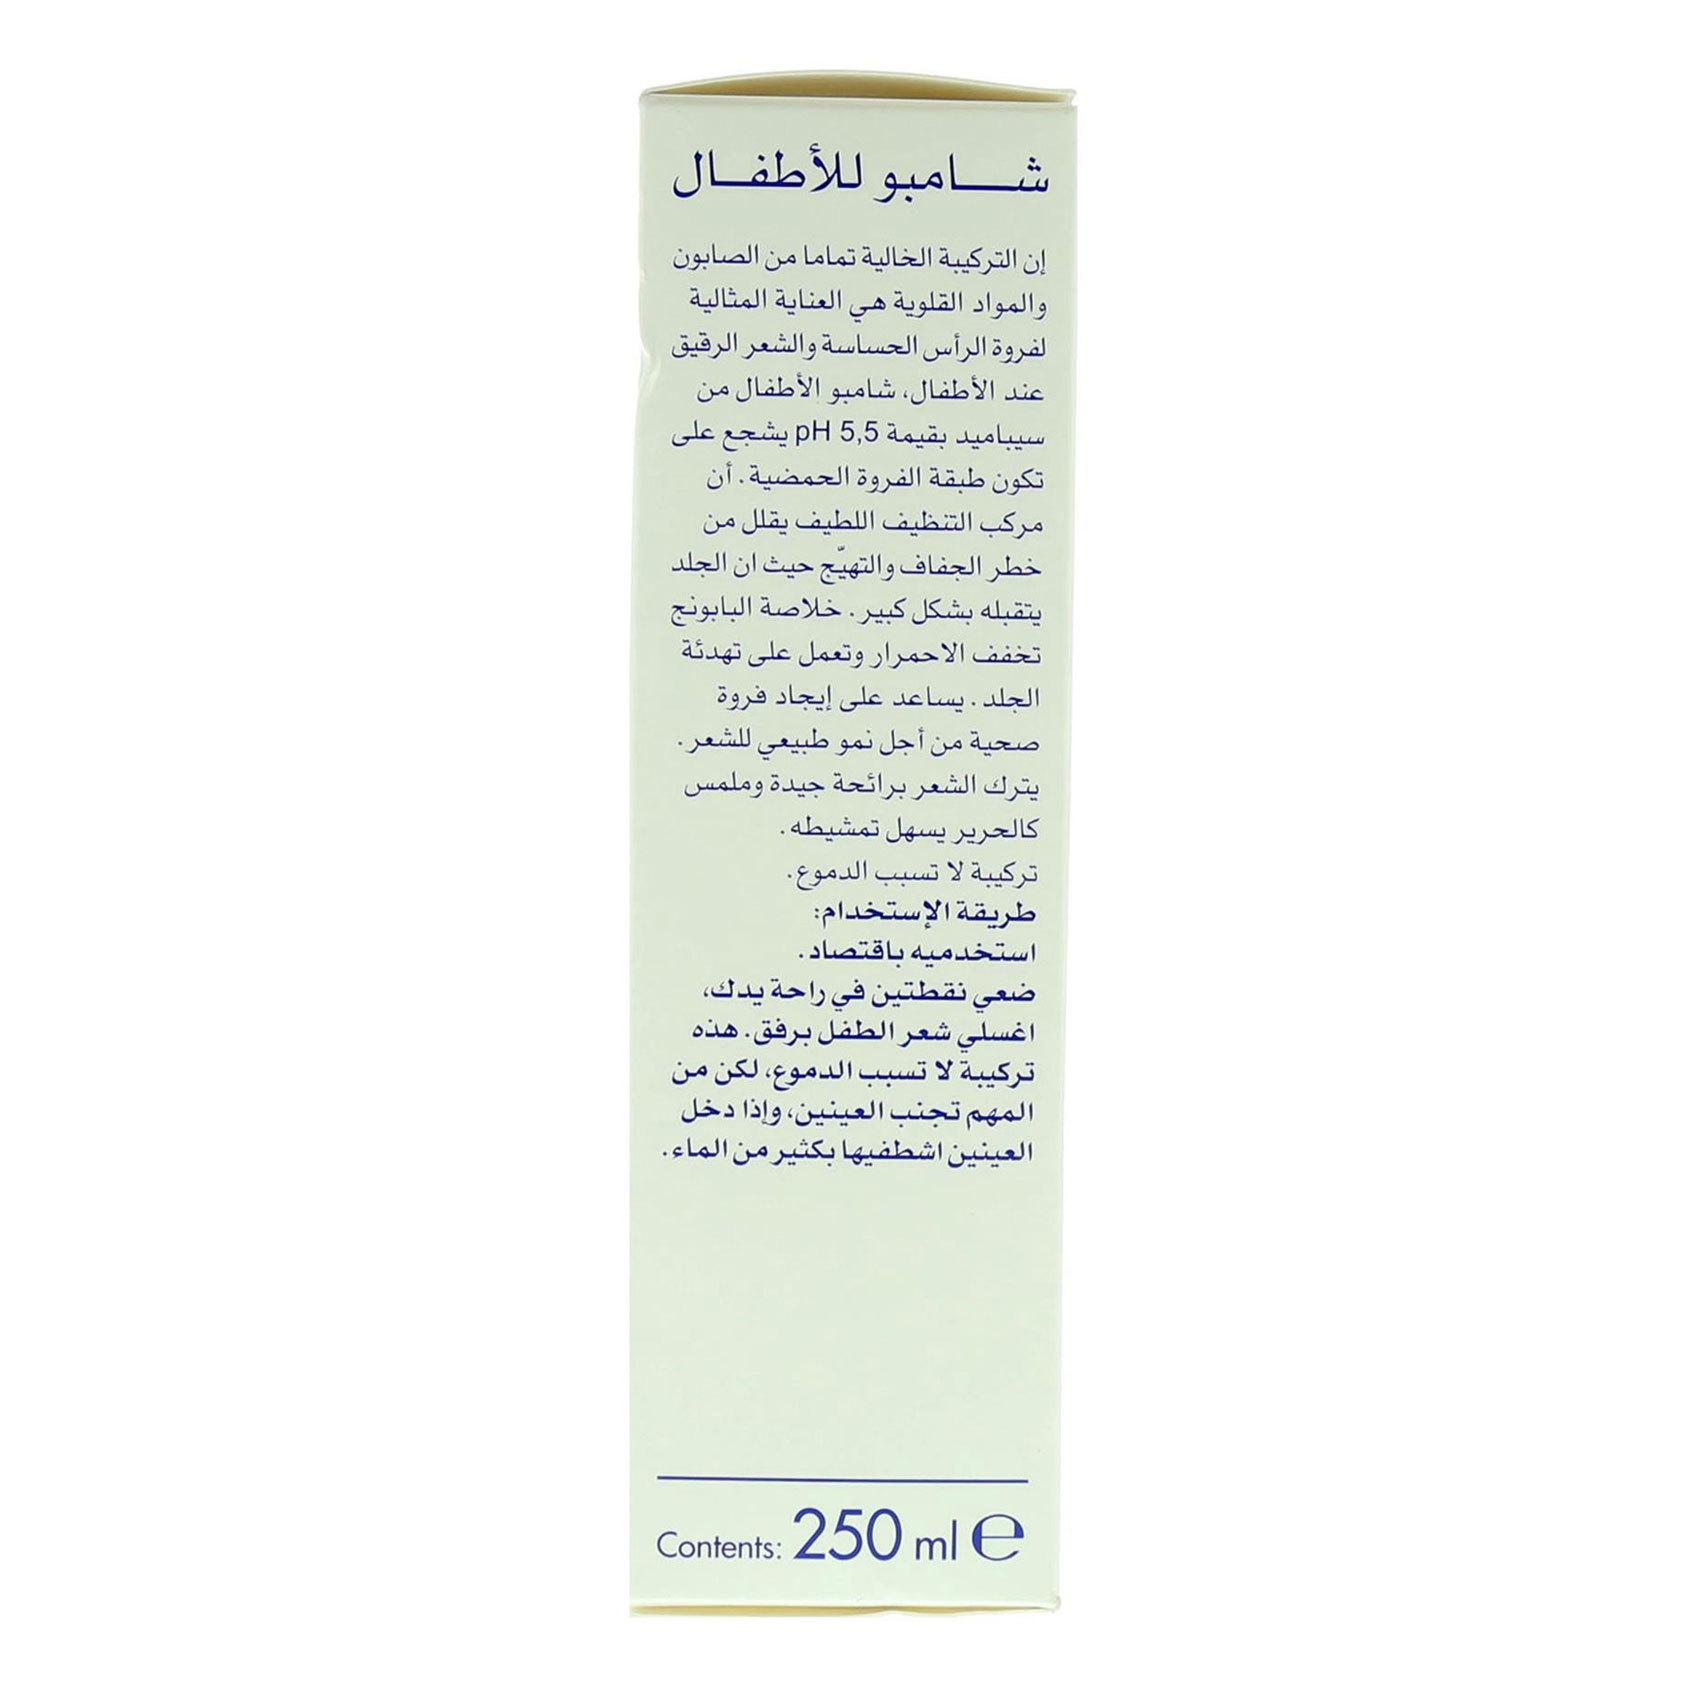 SEBAMED SHAMPOO CHILDREN'S 250ML